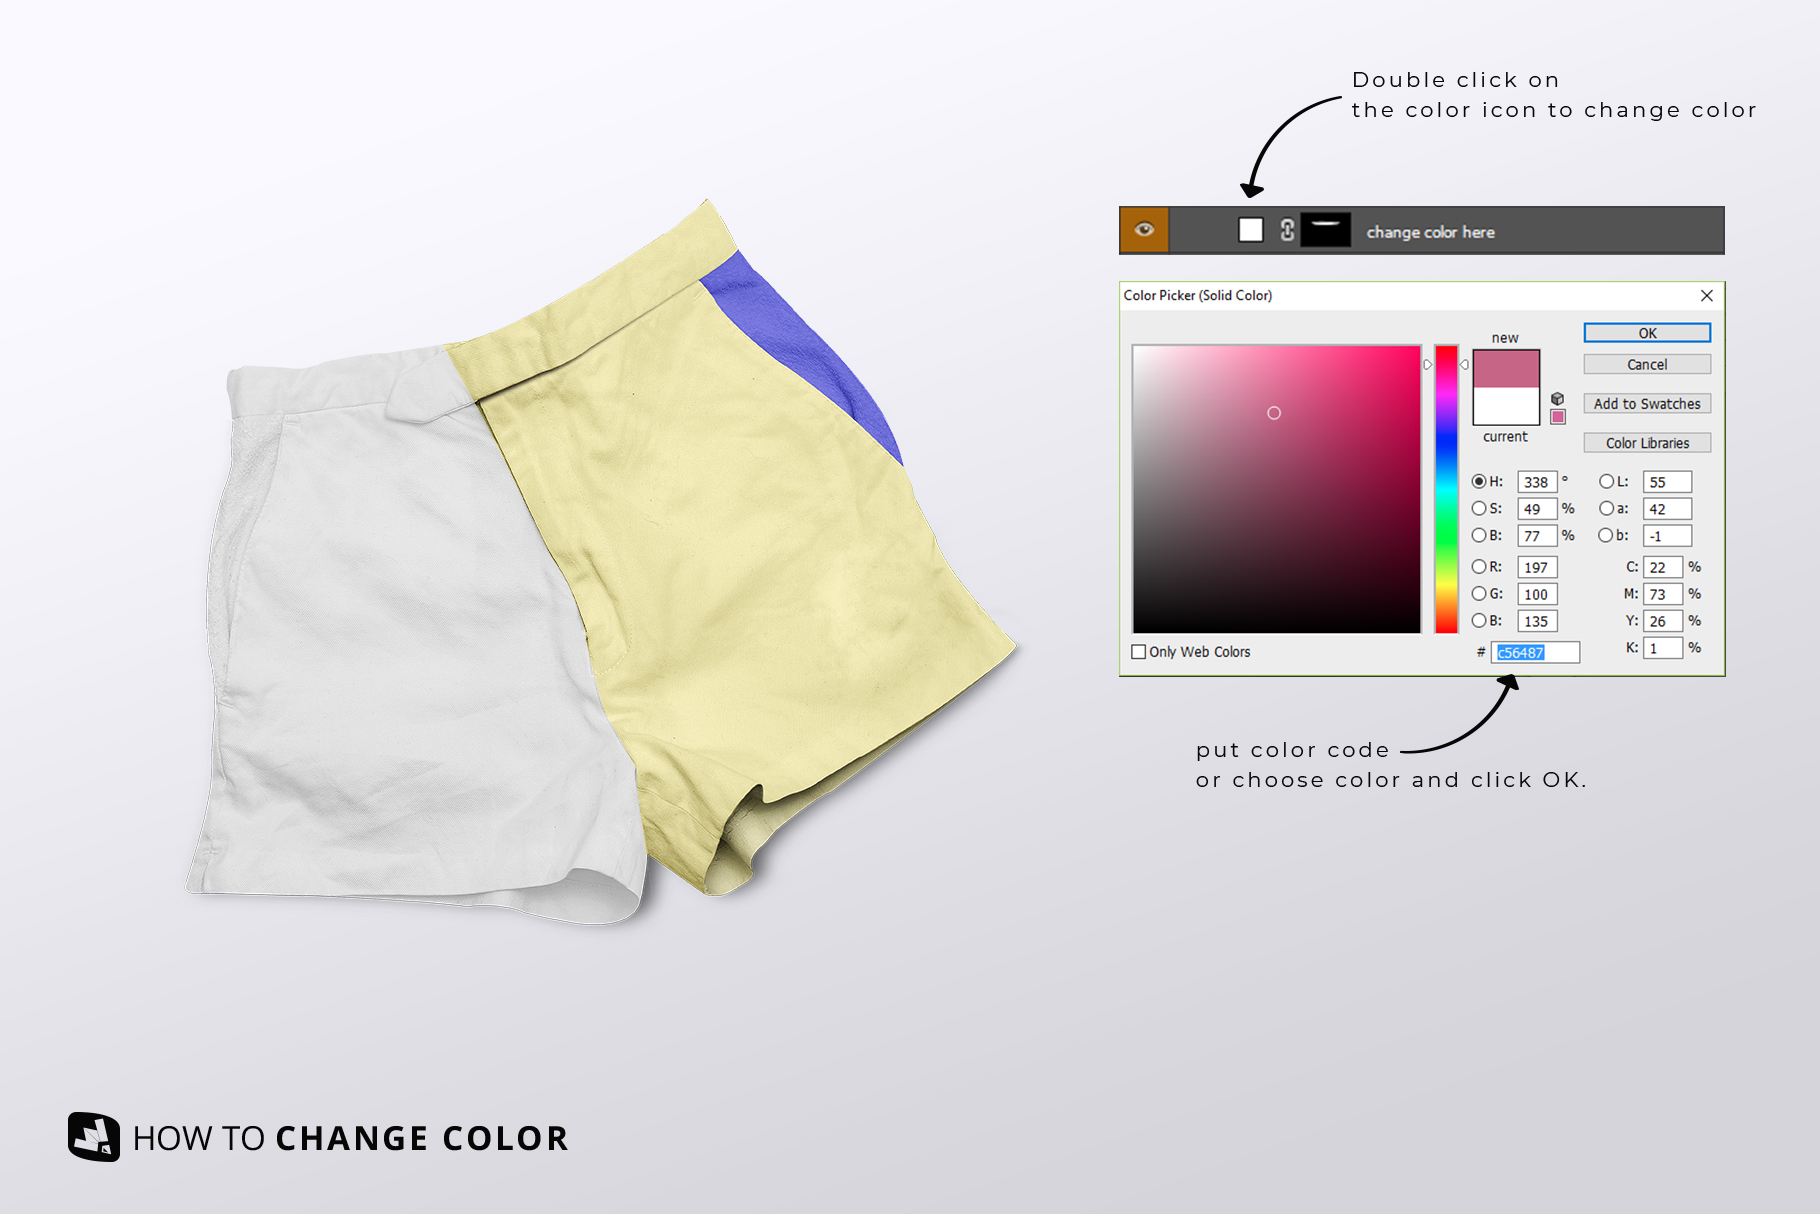 change color of the female cotton hot pants mockup